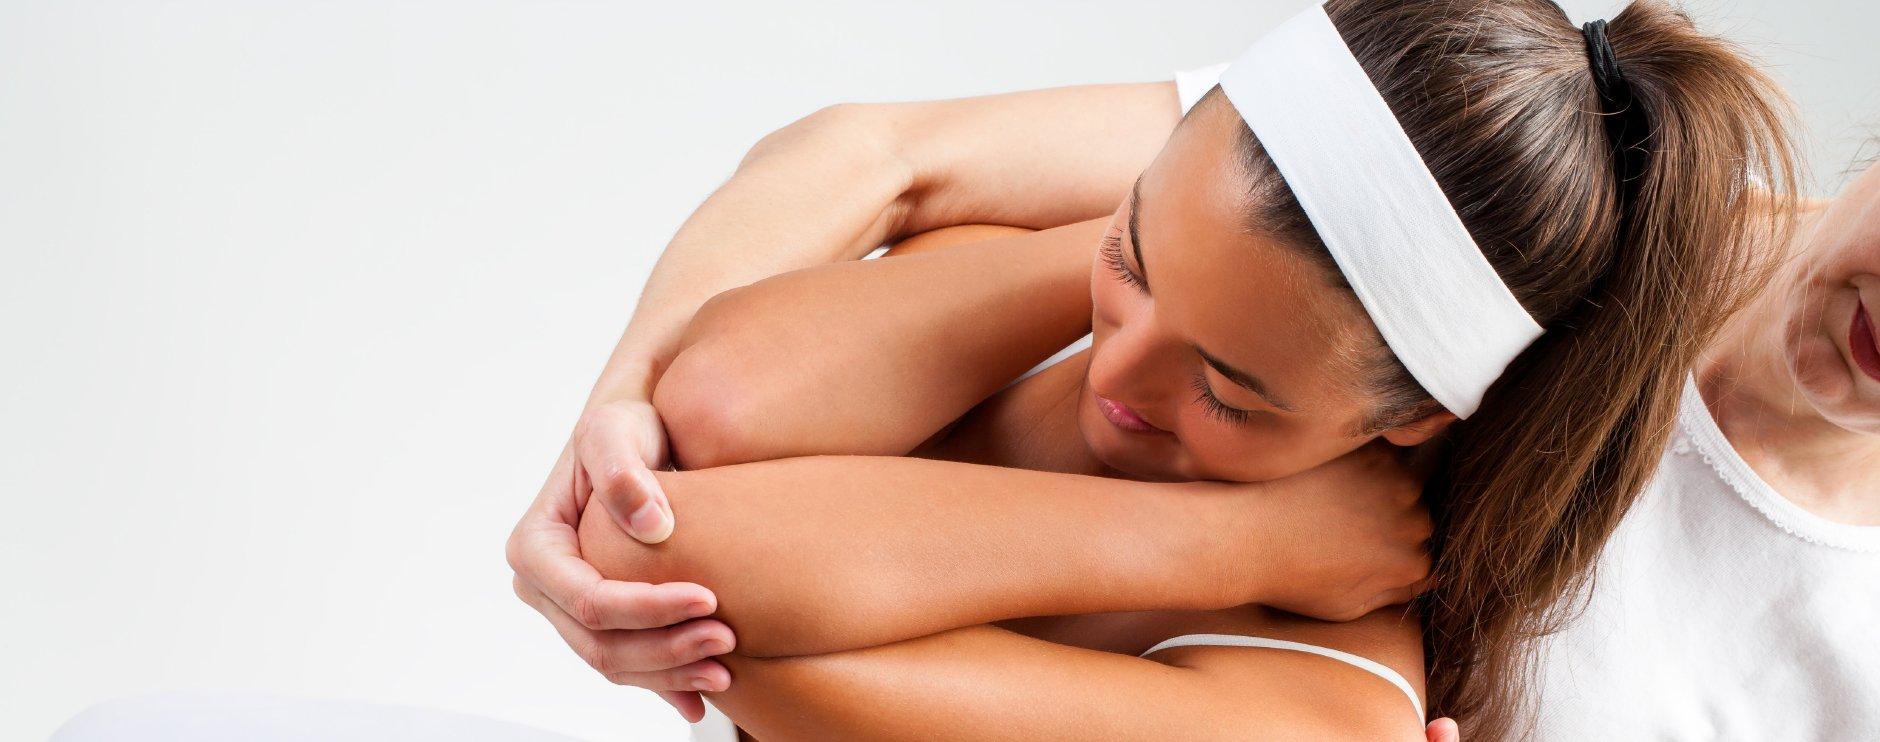 Osteopatia / Fisioterapia